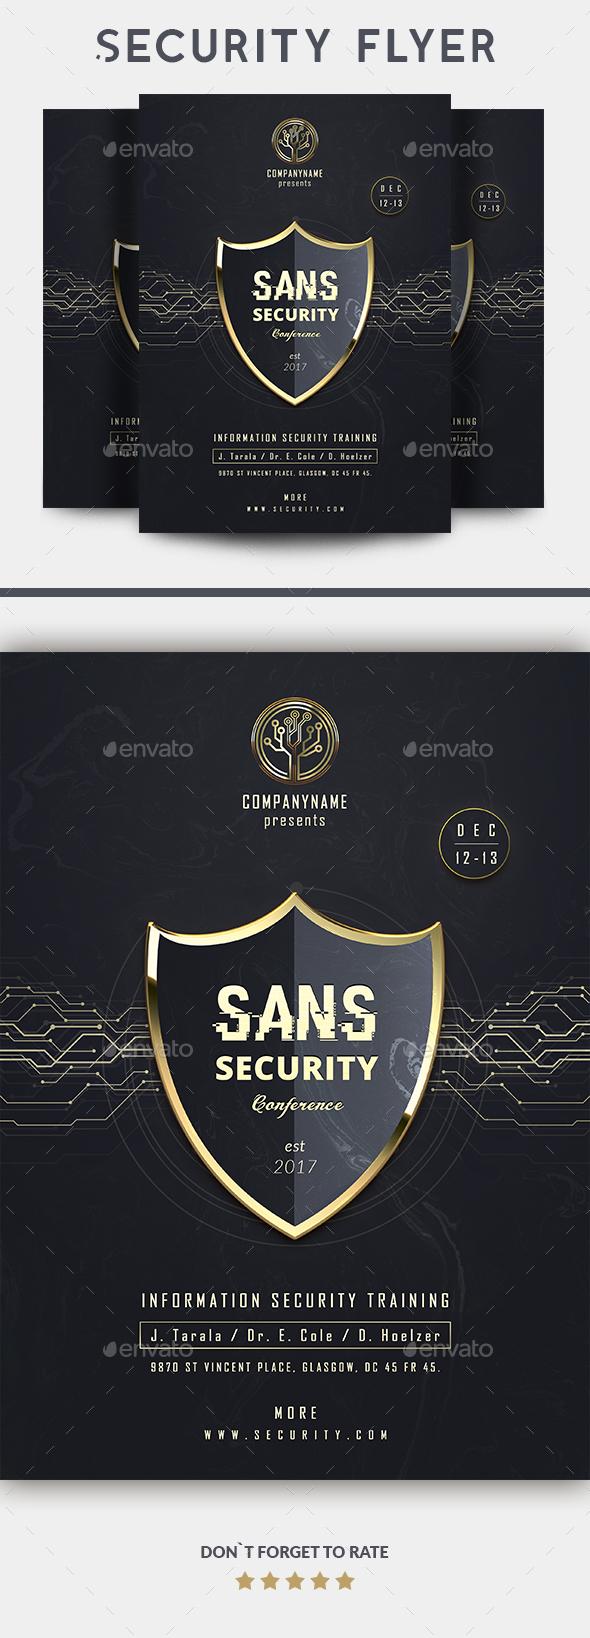 GraphicRiver SANS Security Flyer 20751982